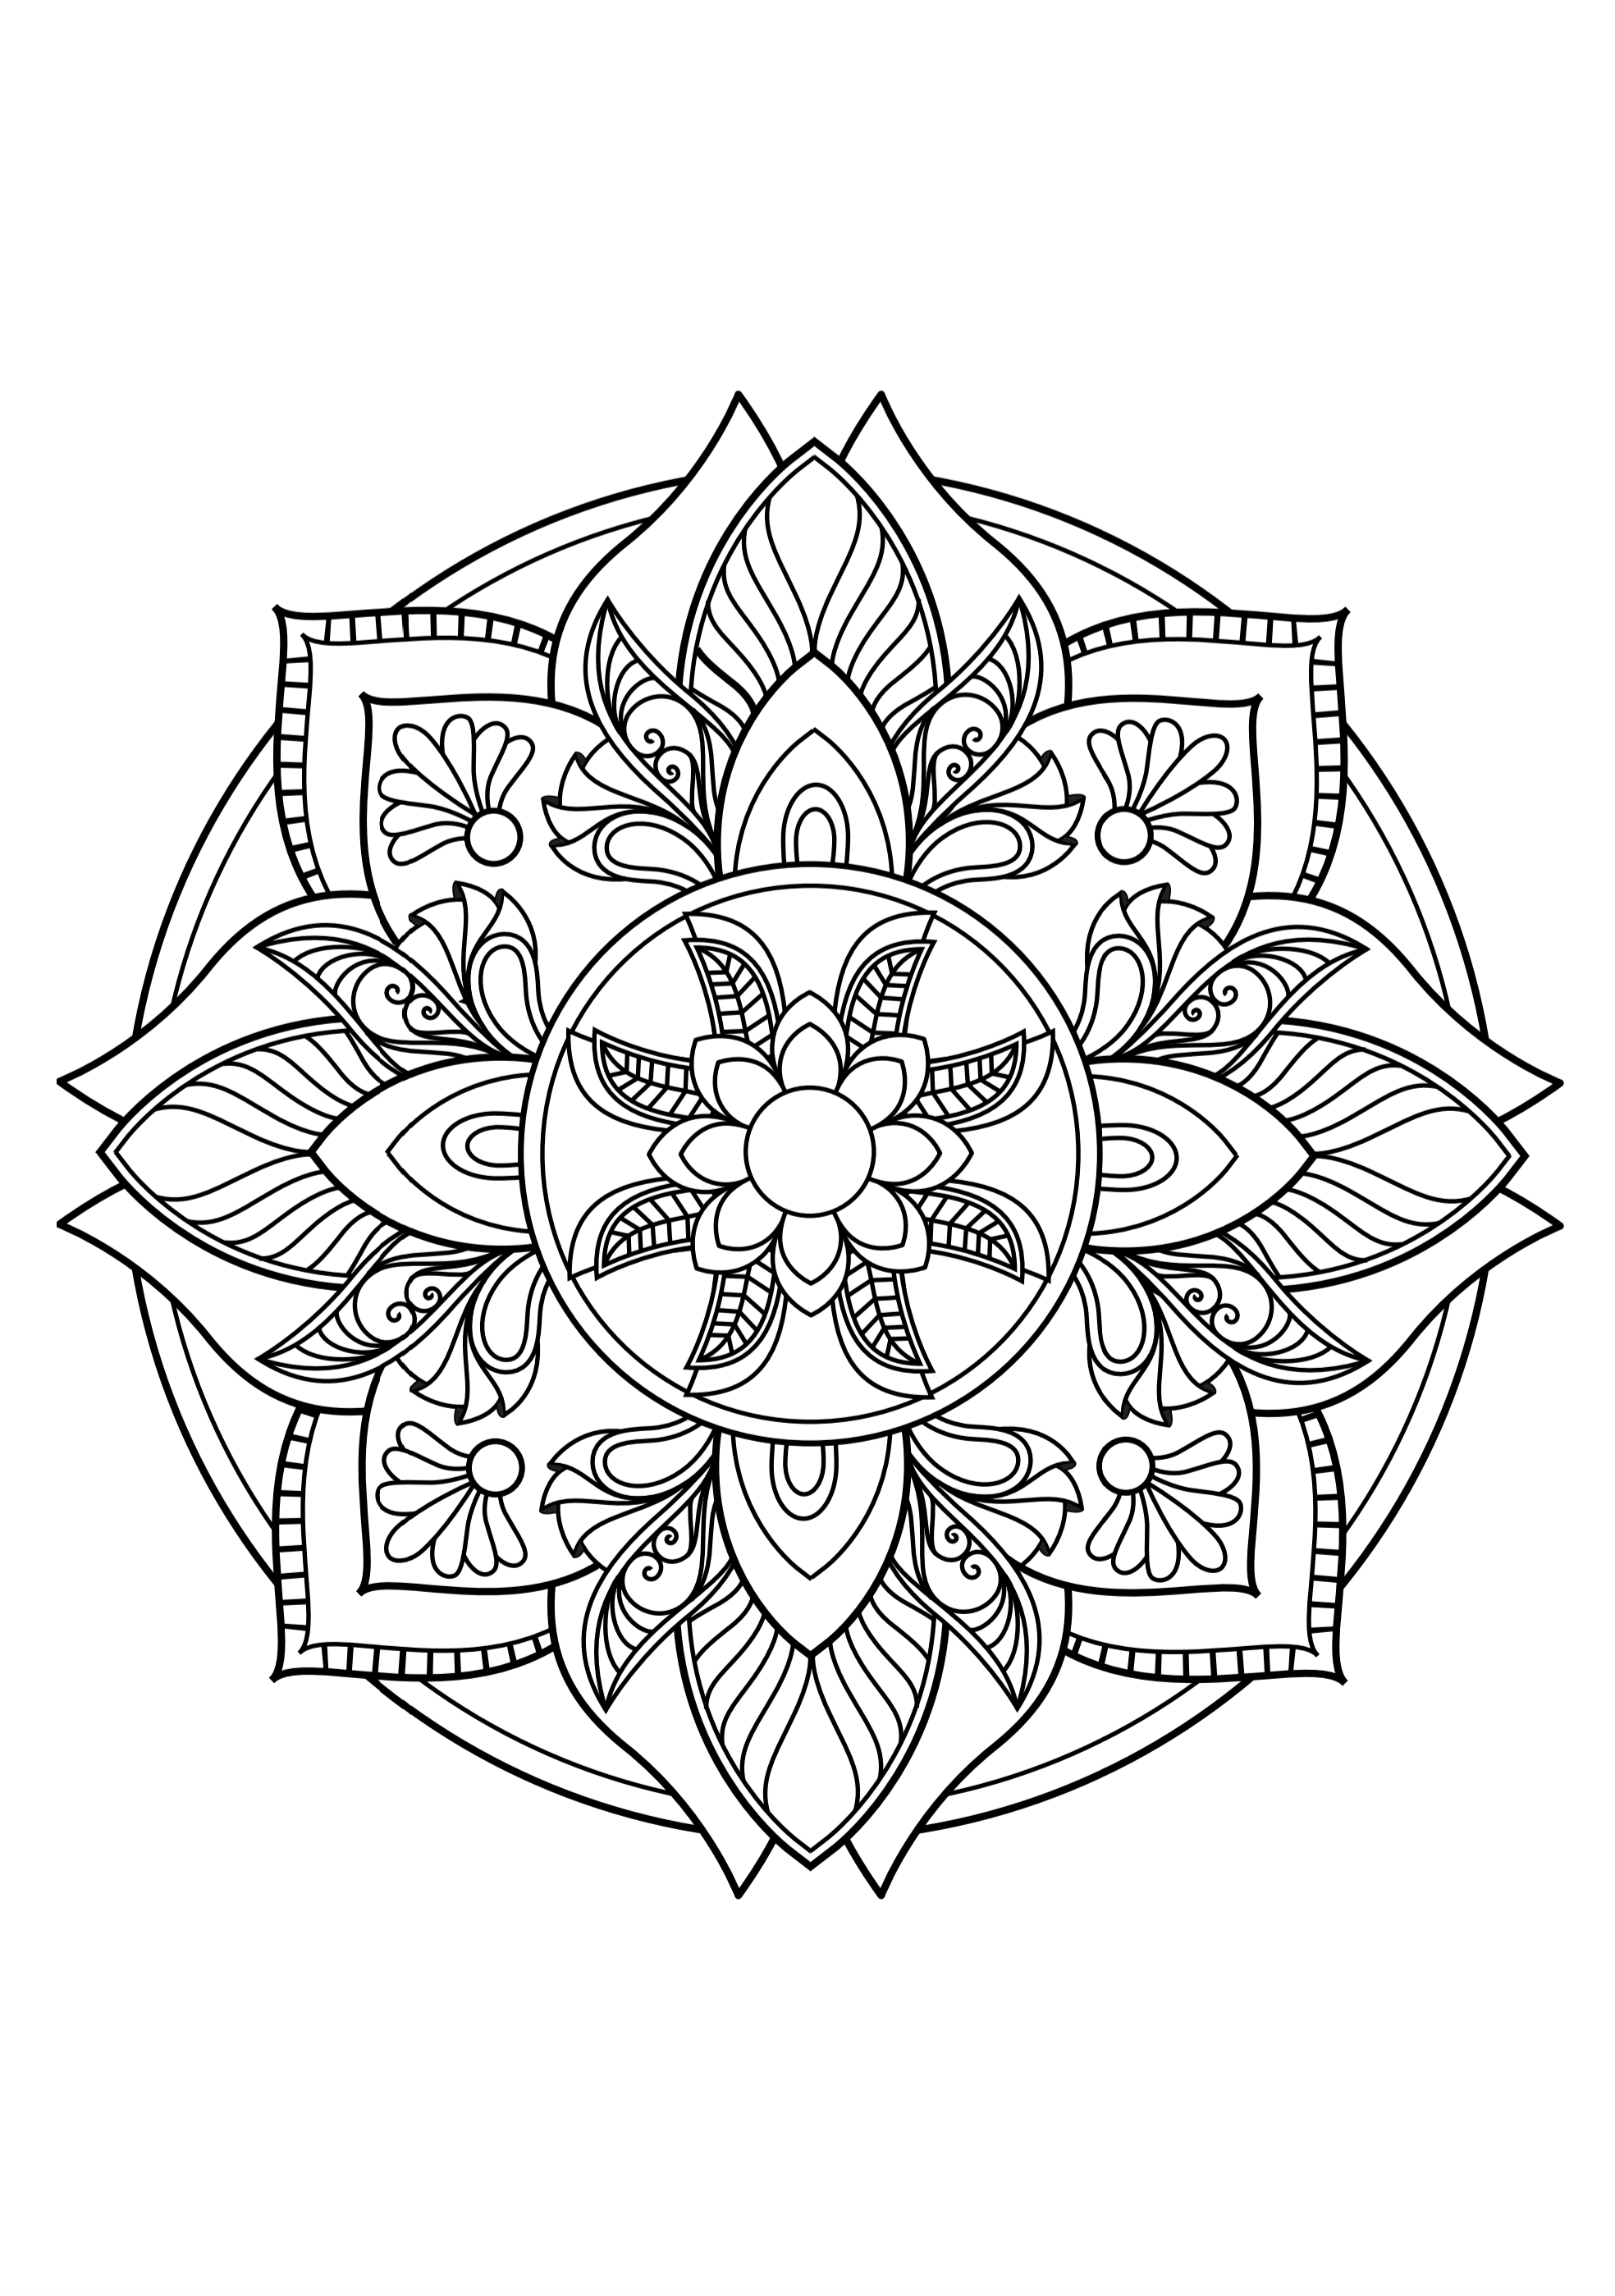 kidsnfunde  malvorlage magic mandalas magic mandalas